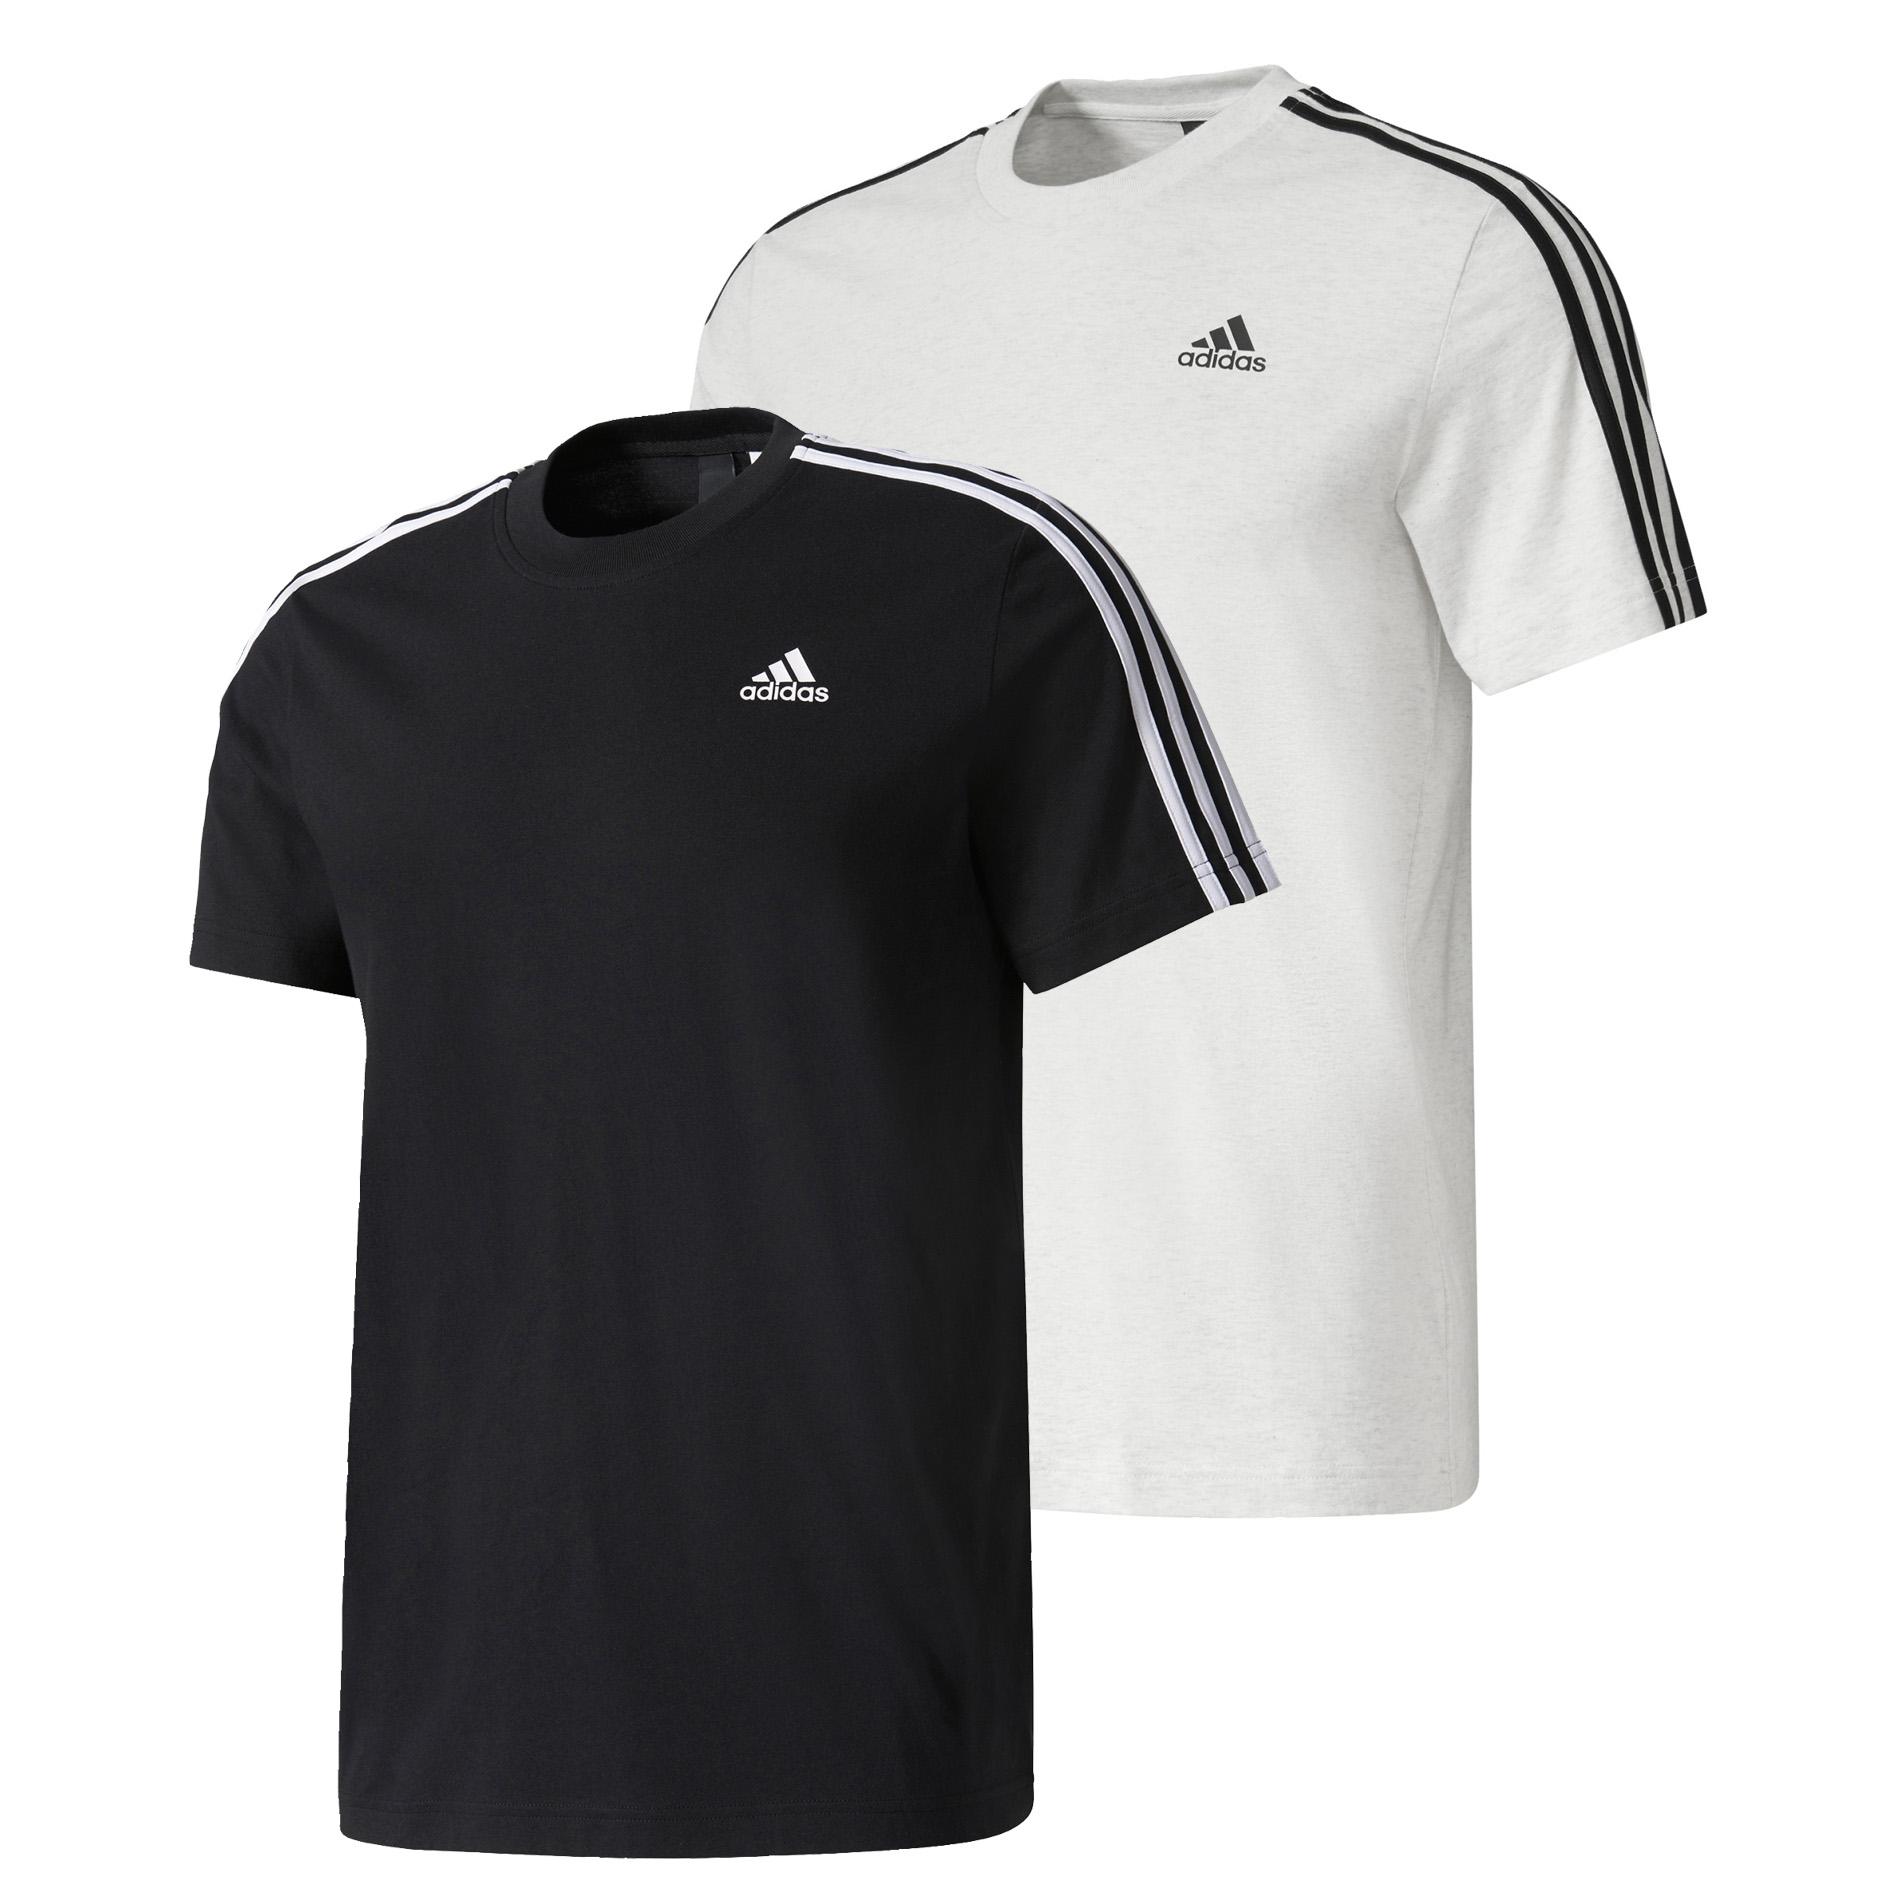 adidas sport essentials 3 stripe mens cotton t shirt tee. Black Bedroom Furniture Sets. Home Design Ideas